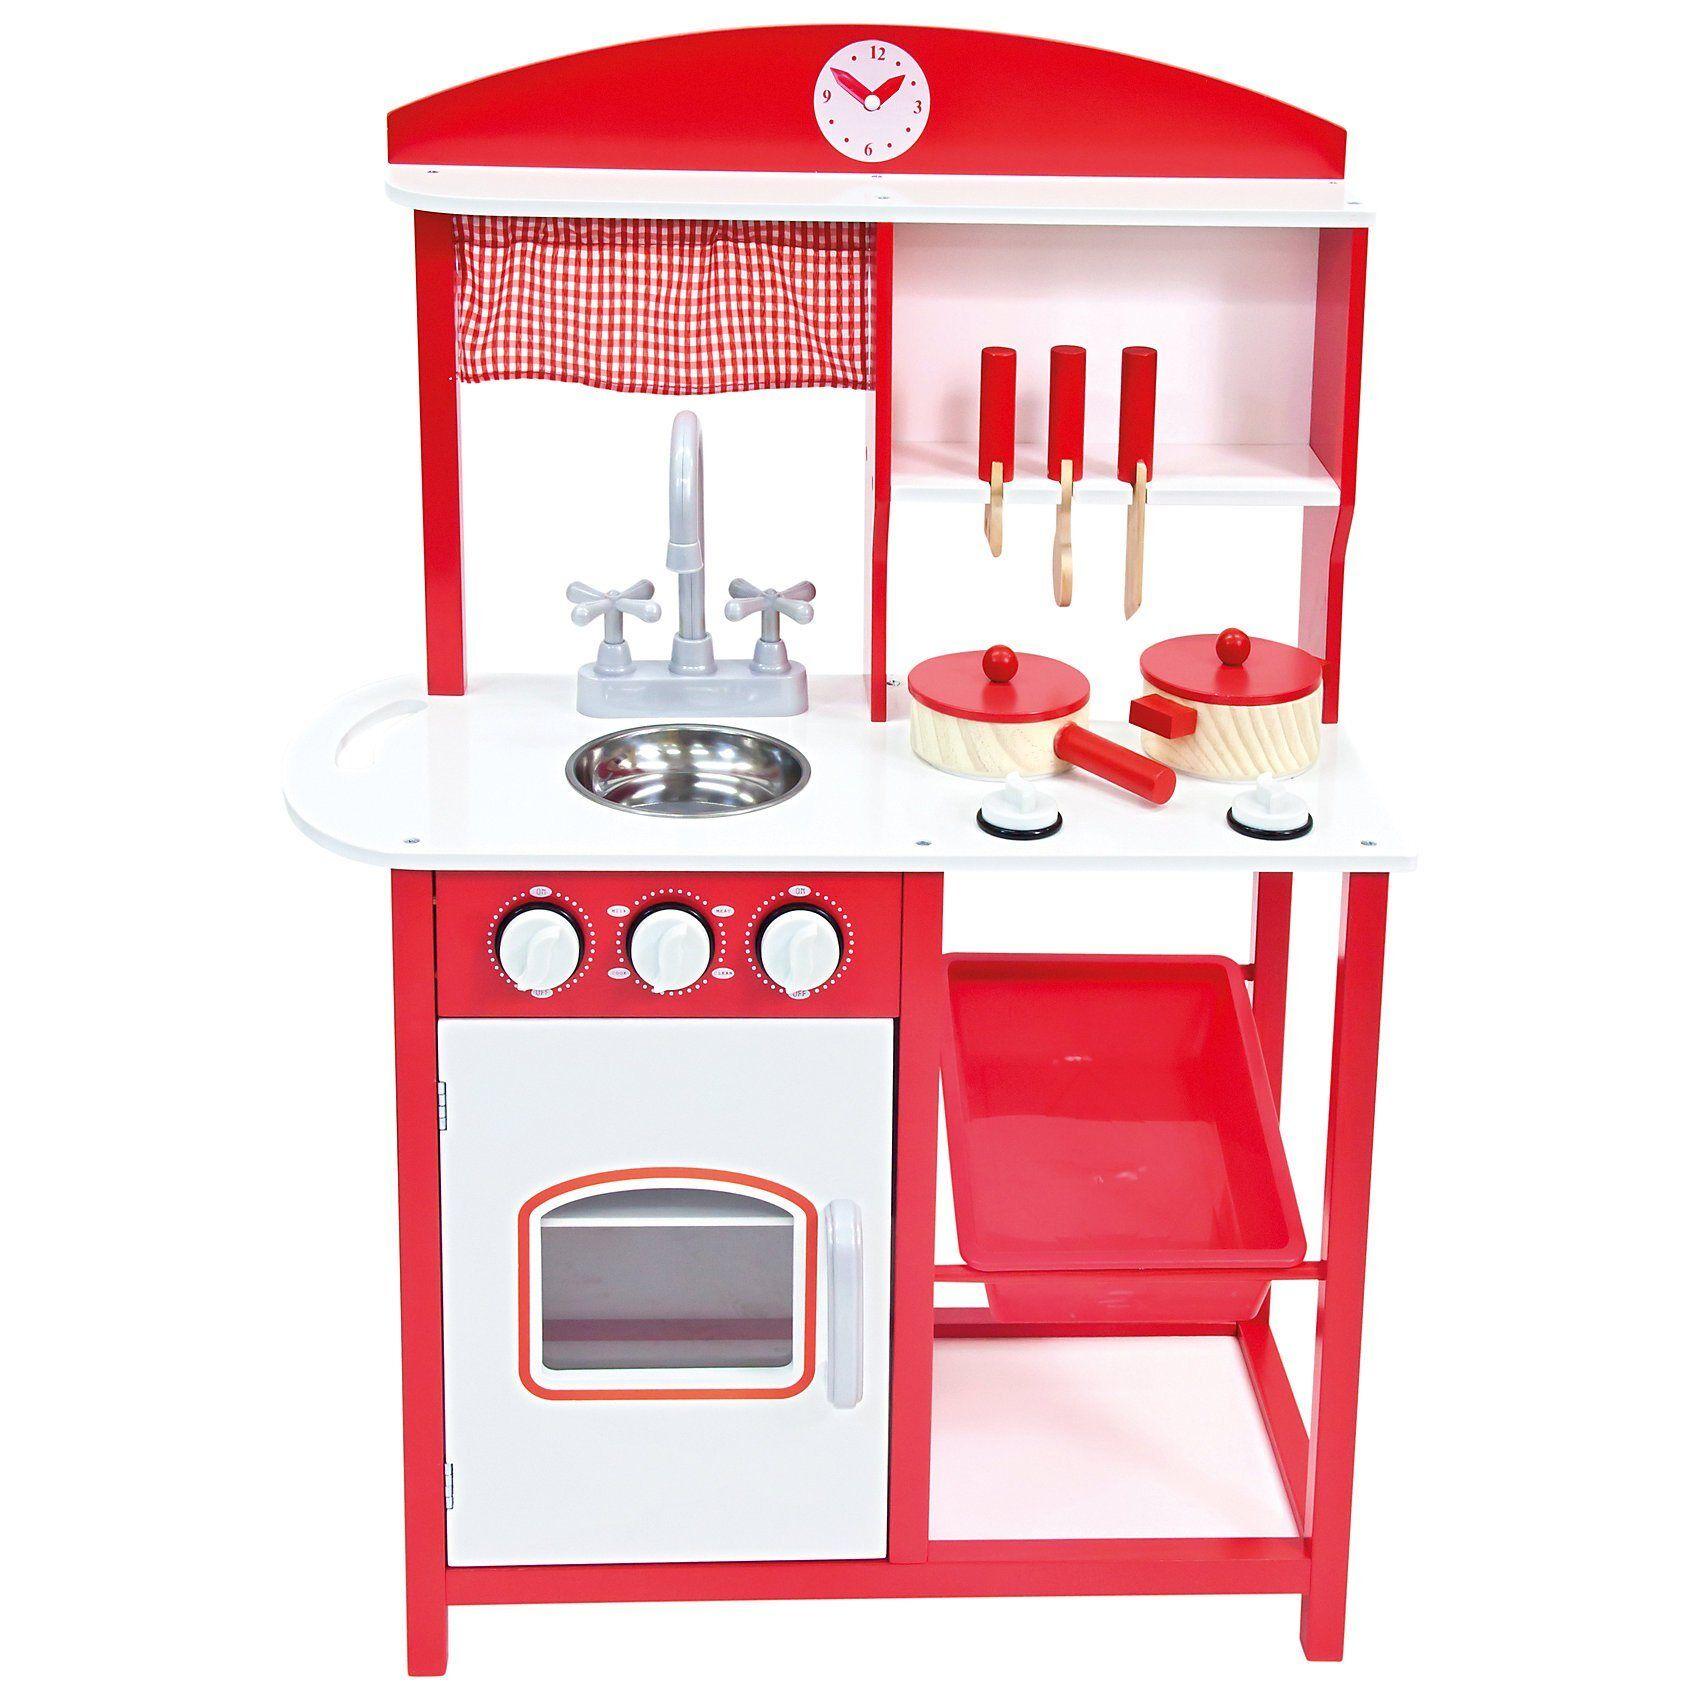 BINO Holz-Kinderküche Delicia mit Zubehör, 8tlg.